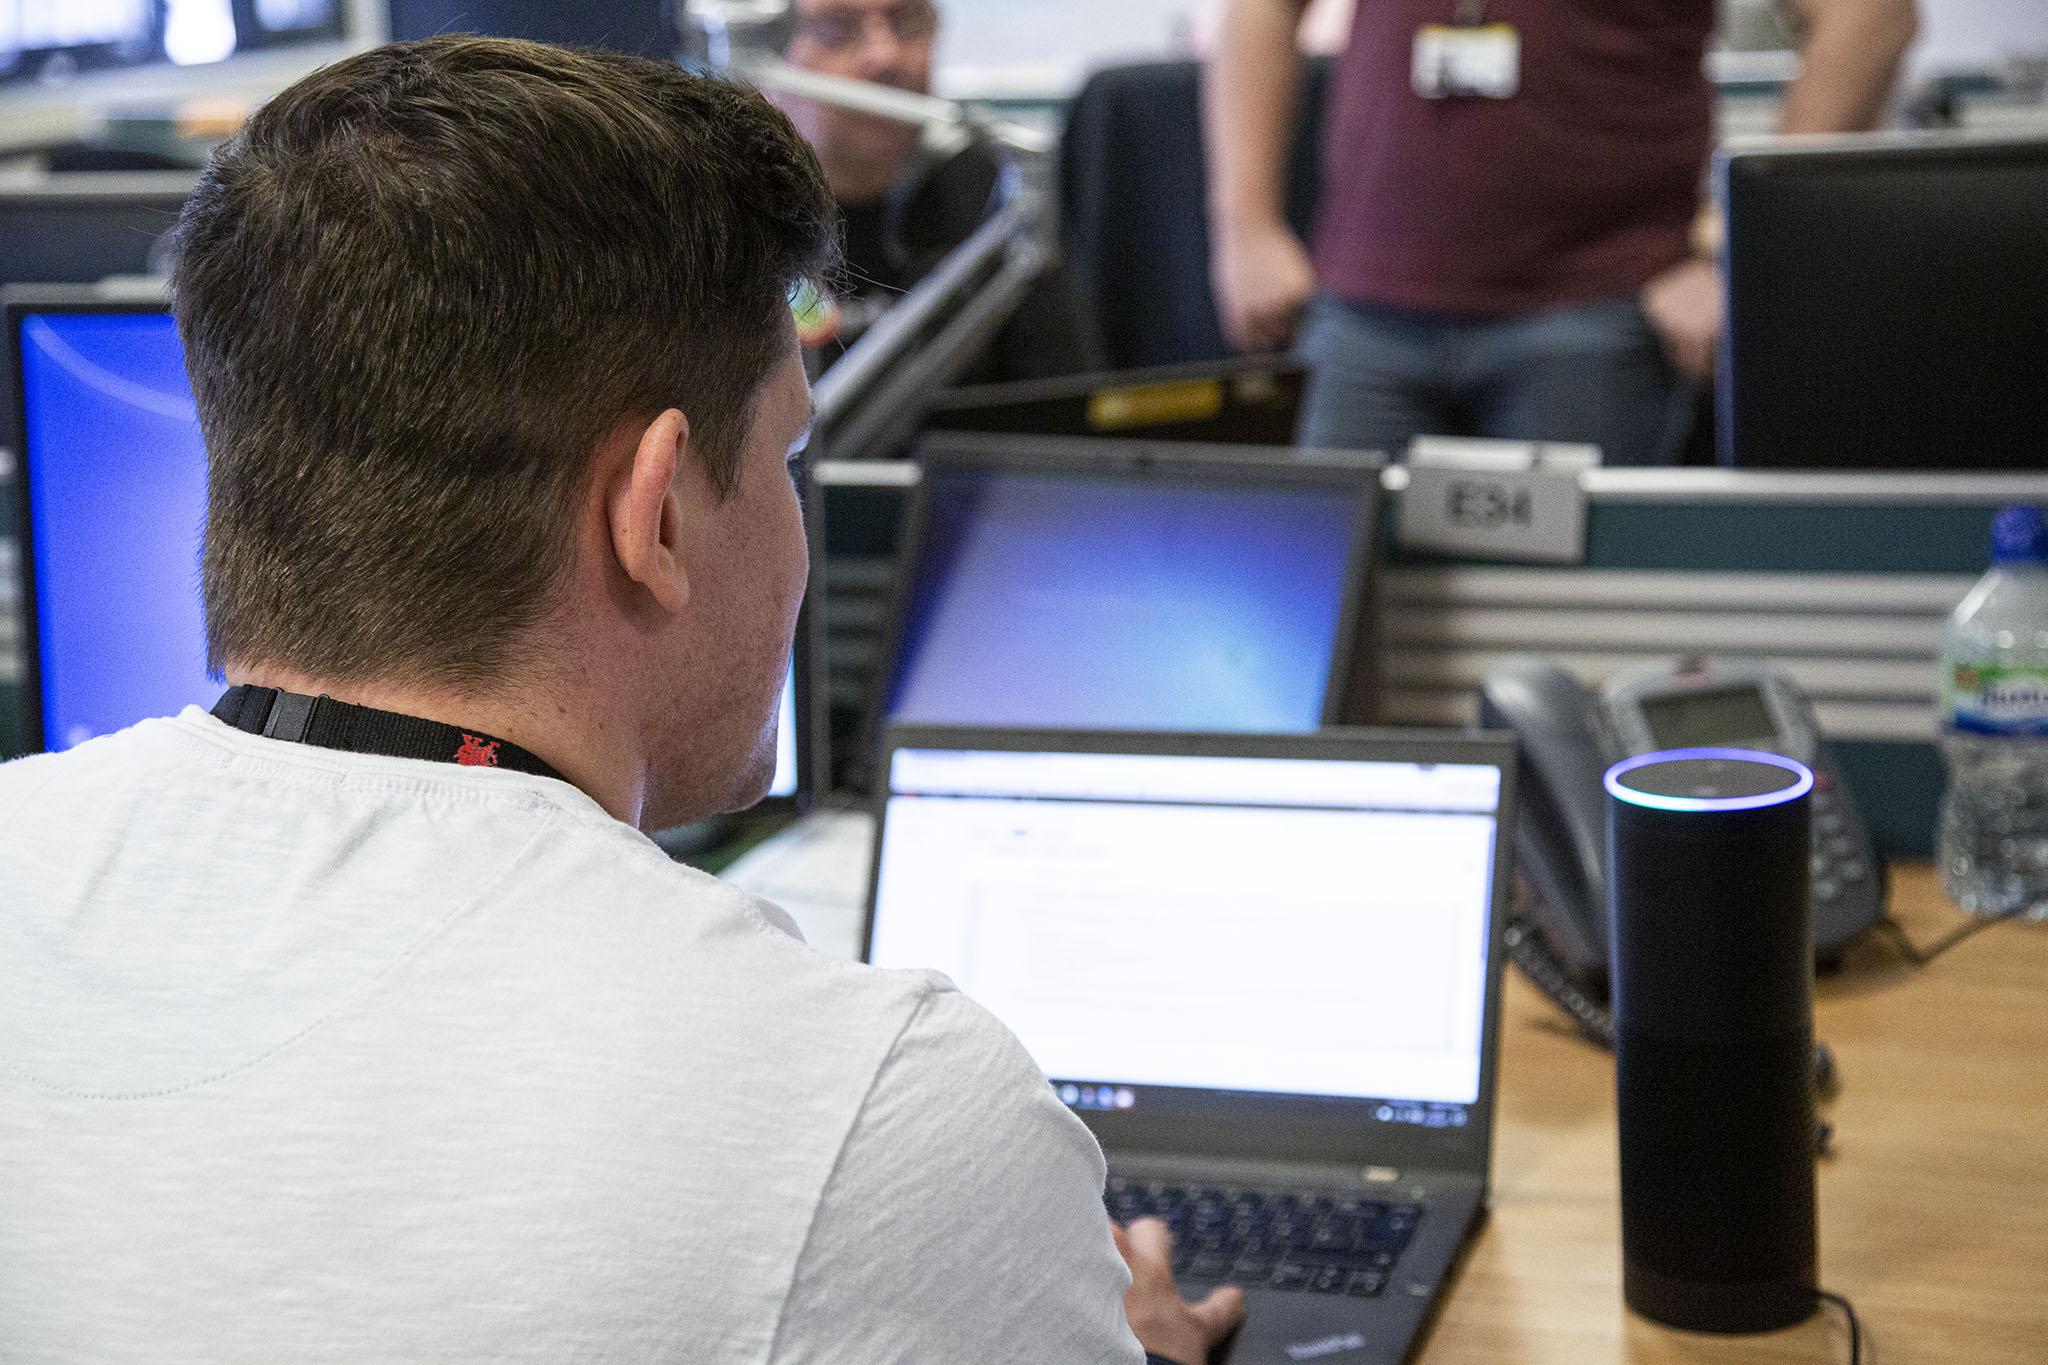 Male DfT Digital professional using a laptop.